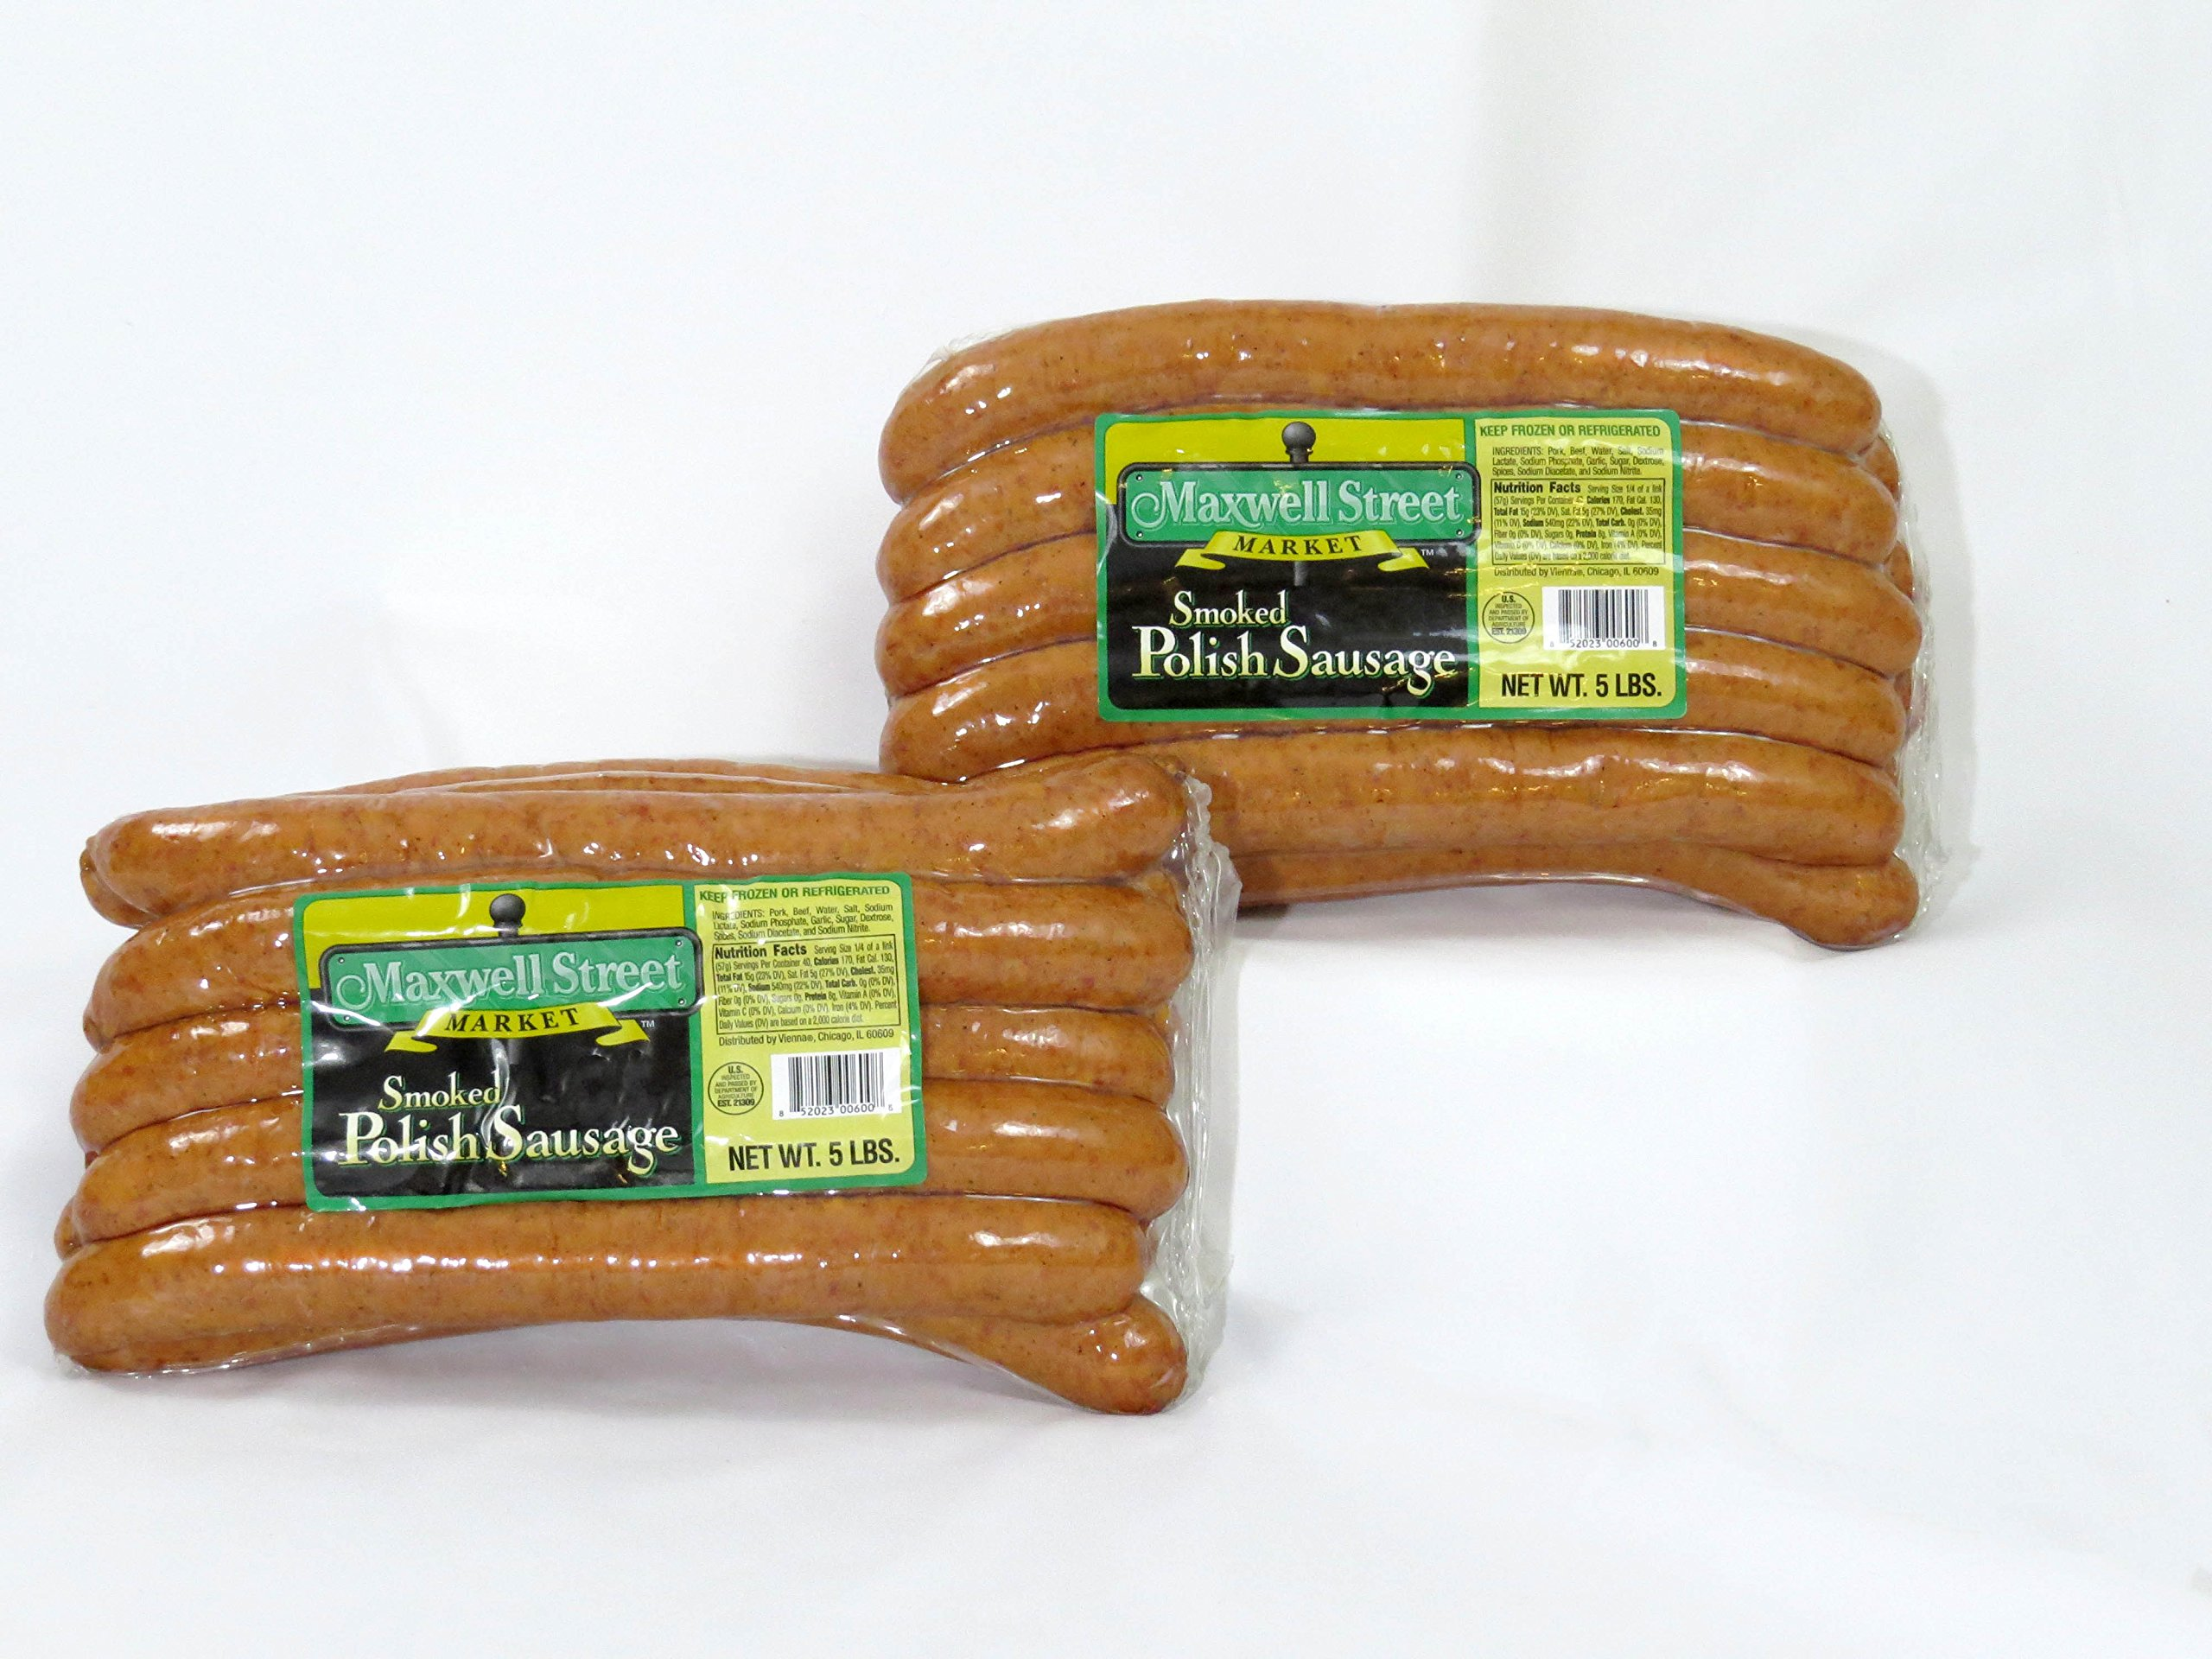 Maxwell Street Market - Smoked Polish Sausage 12'' 2:1 10 lbs. (20 count)